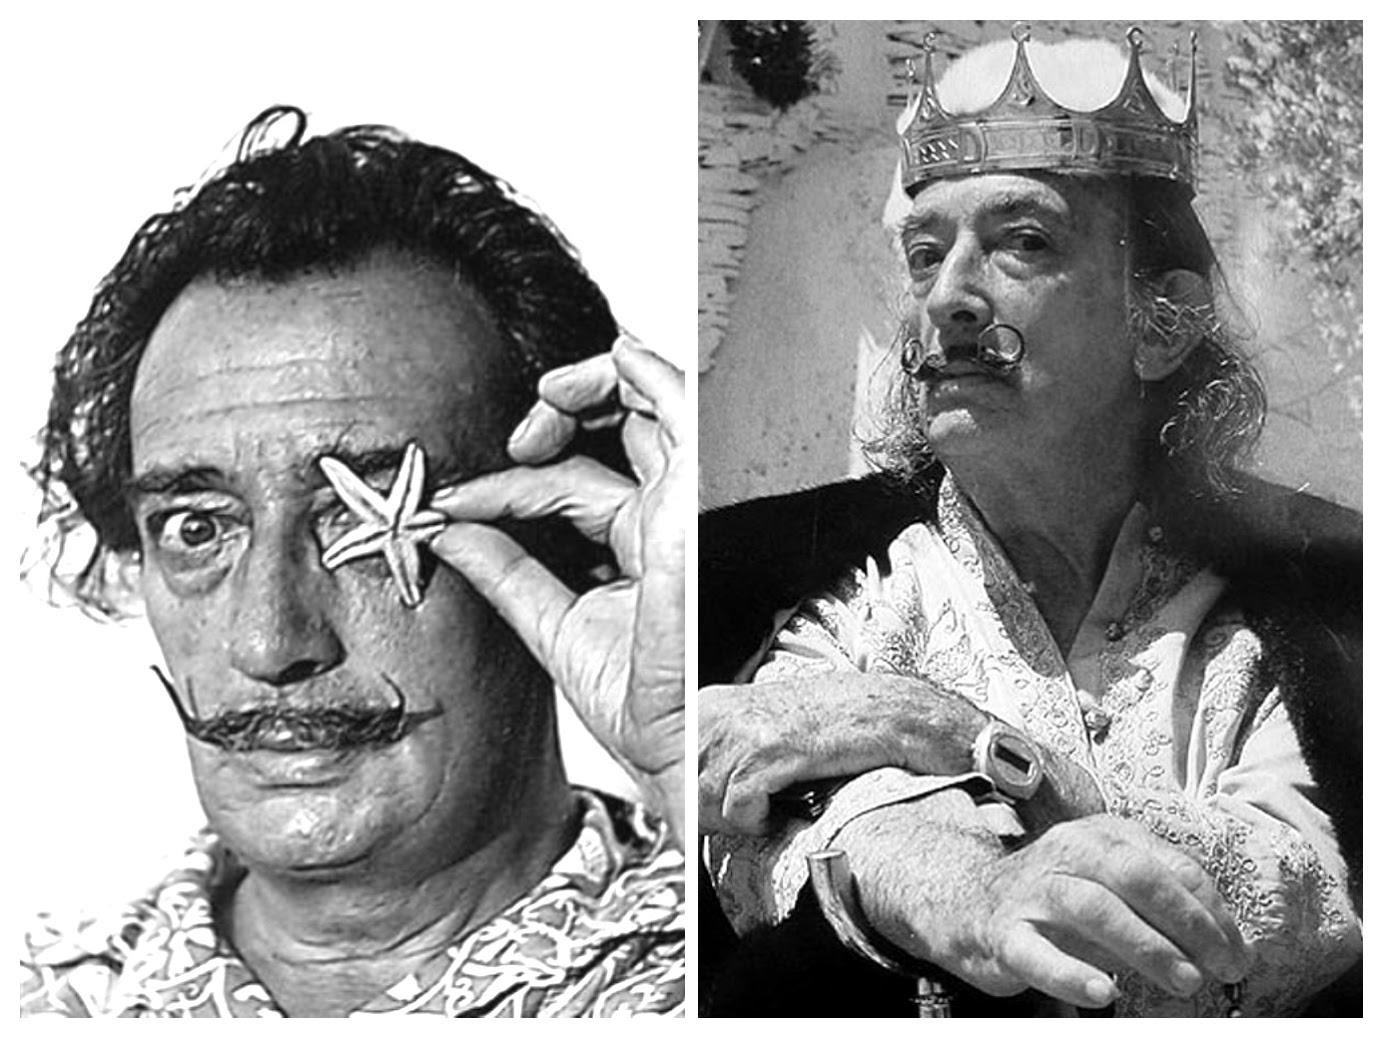 Salvador DALI (1904 – 1989) -Surrealistic king – Photo collage